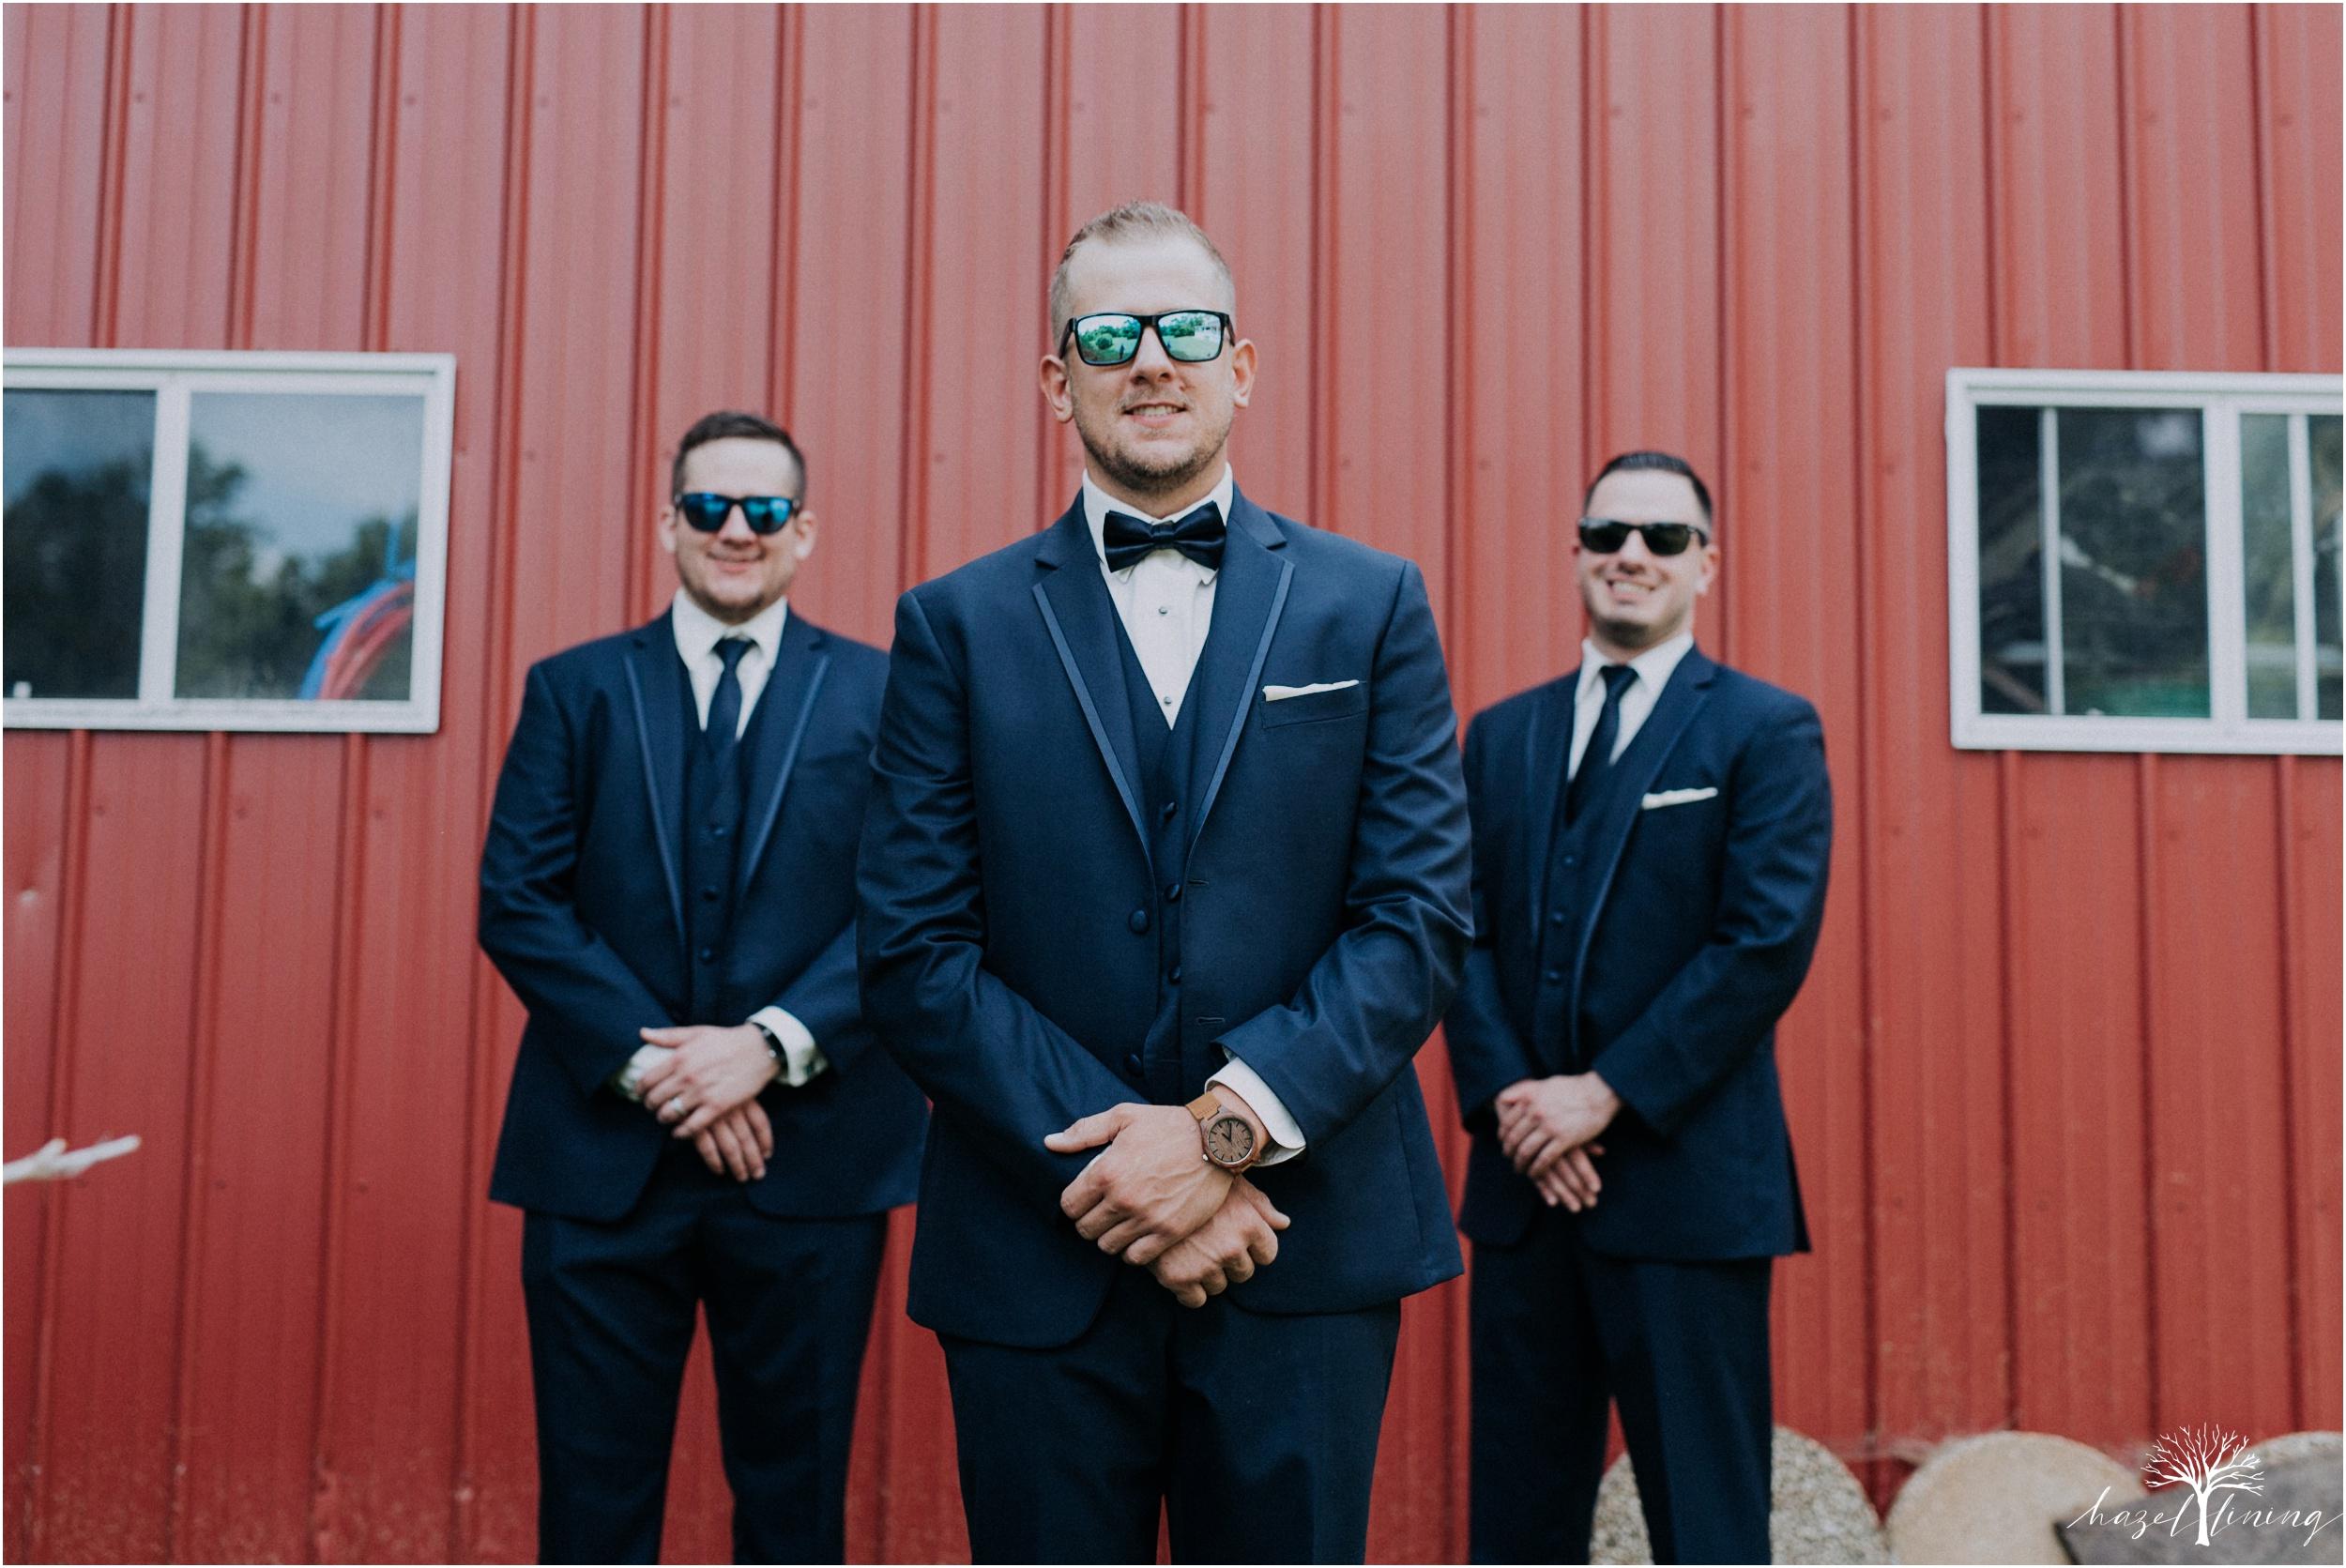 alyssa-james-stiteler-wedding-loft-and-sweet-water-cc-pennsburg-pennsylvania-hazel-lining-travel-wedding-elopement-photography_0009.jpg